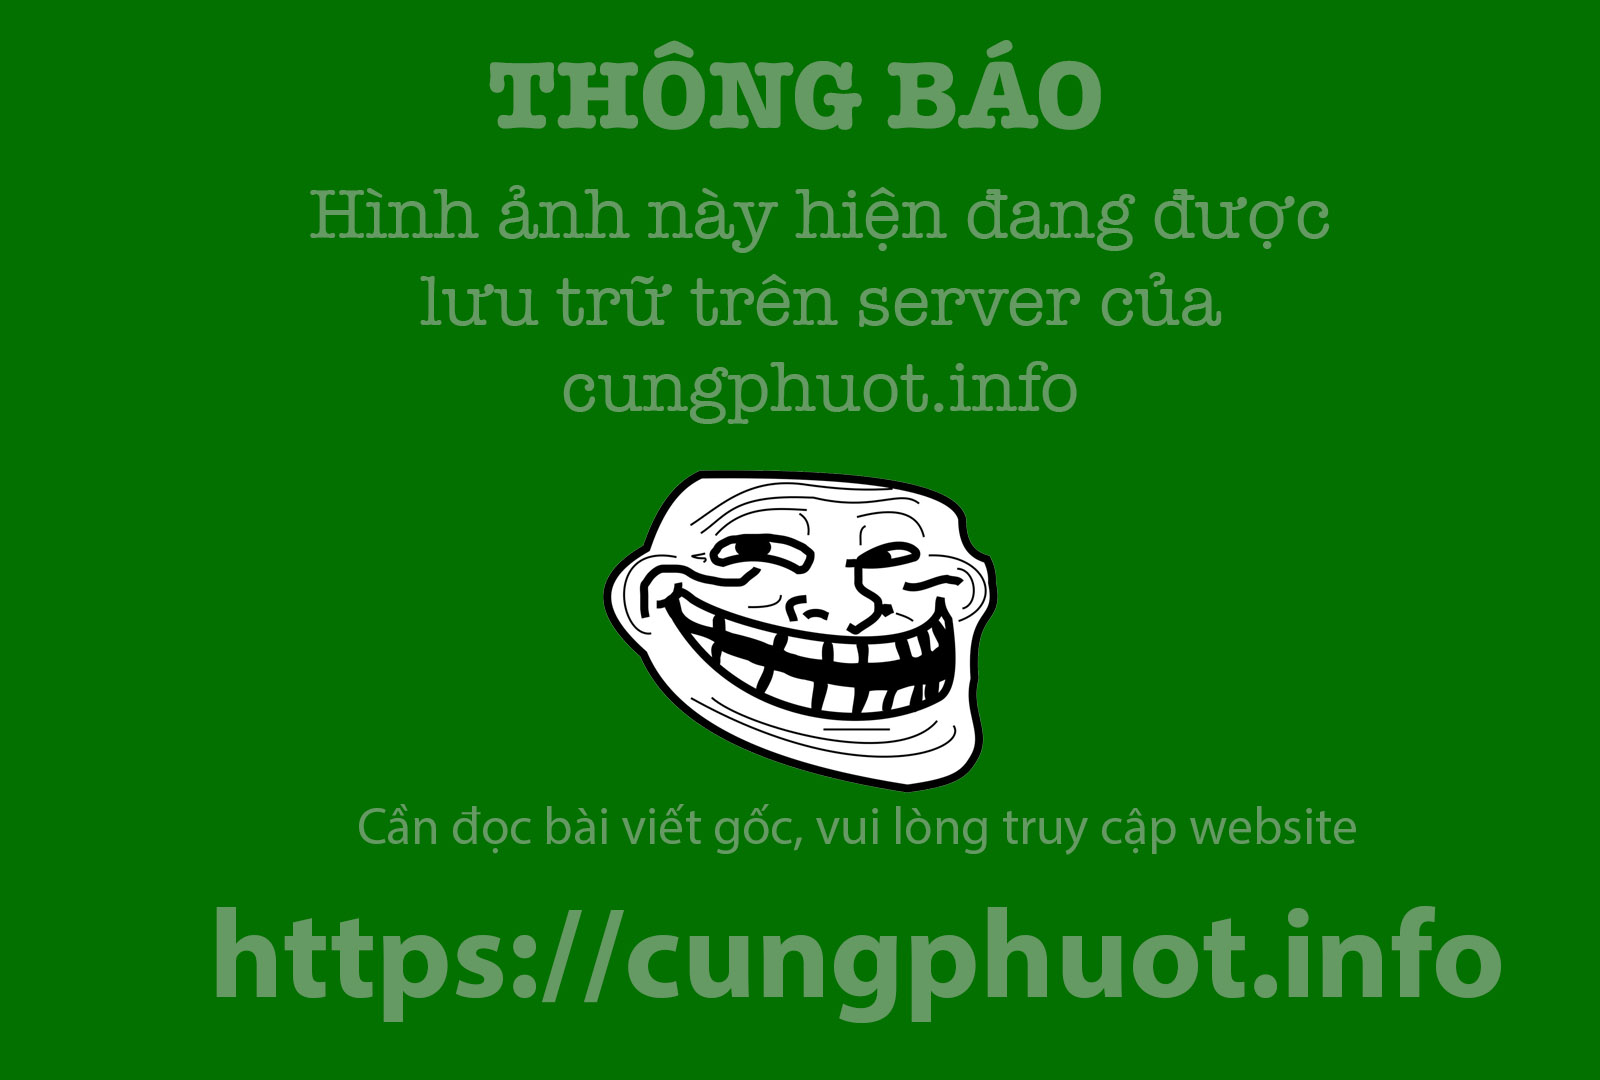 Chon bien cuong 'troi thap, dat cao' o Nam Can hinh anh 1